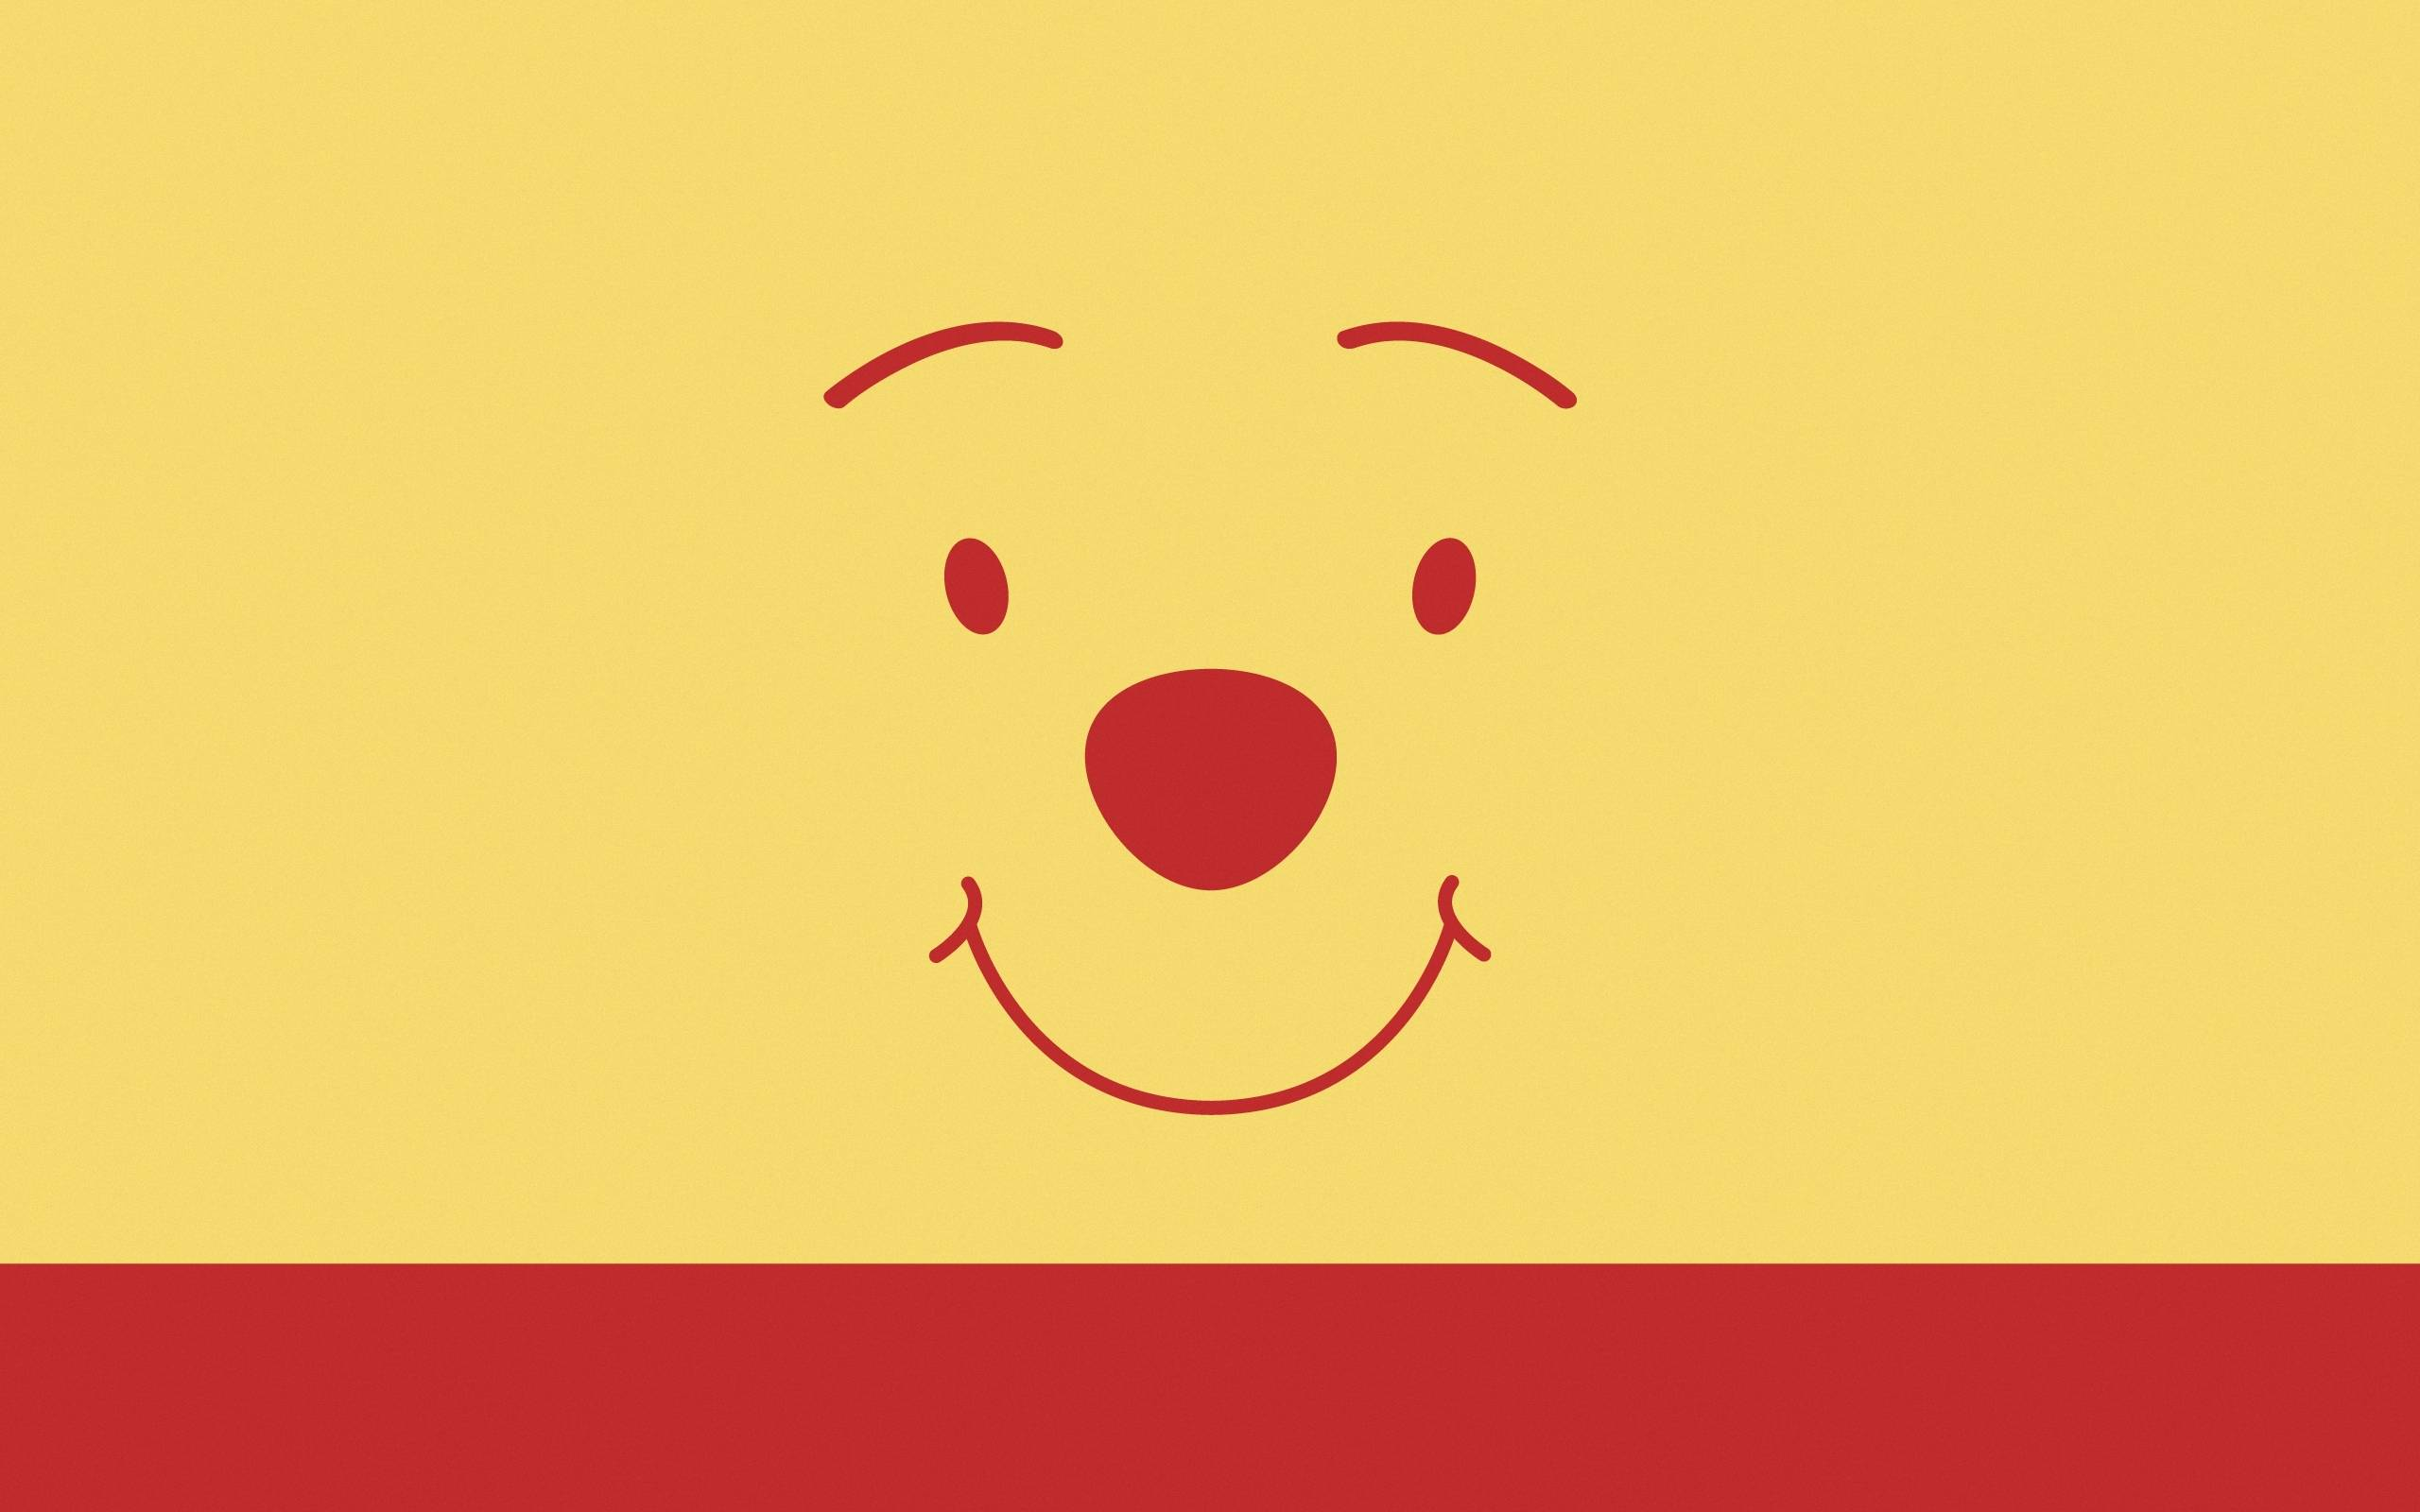 winnie the pooh wallpaper christmas